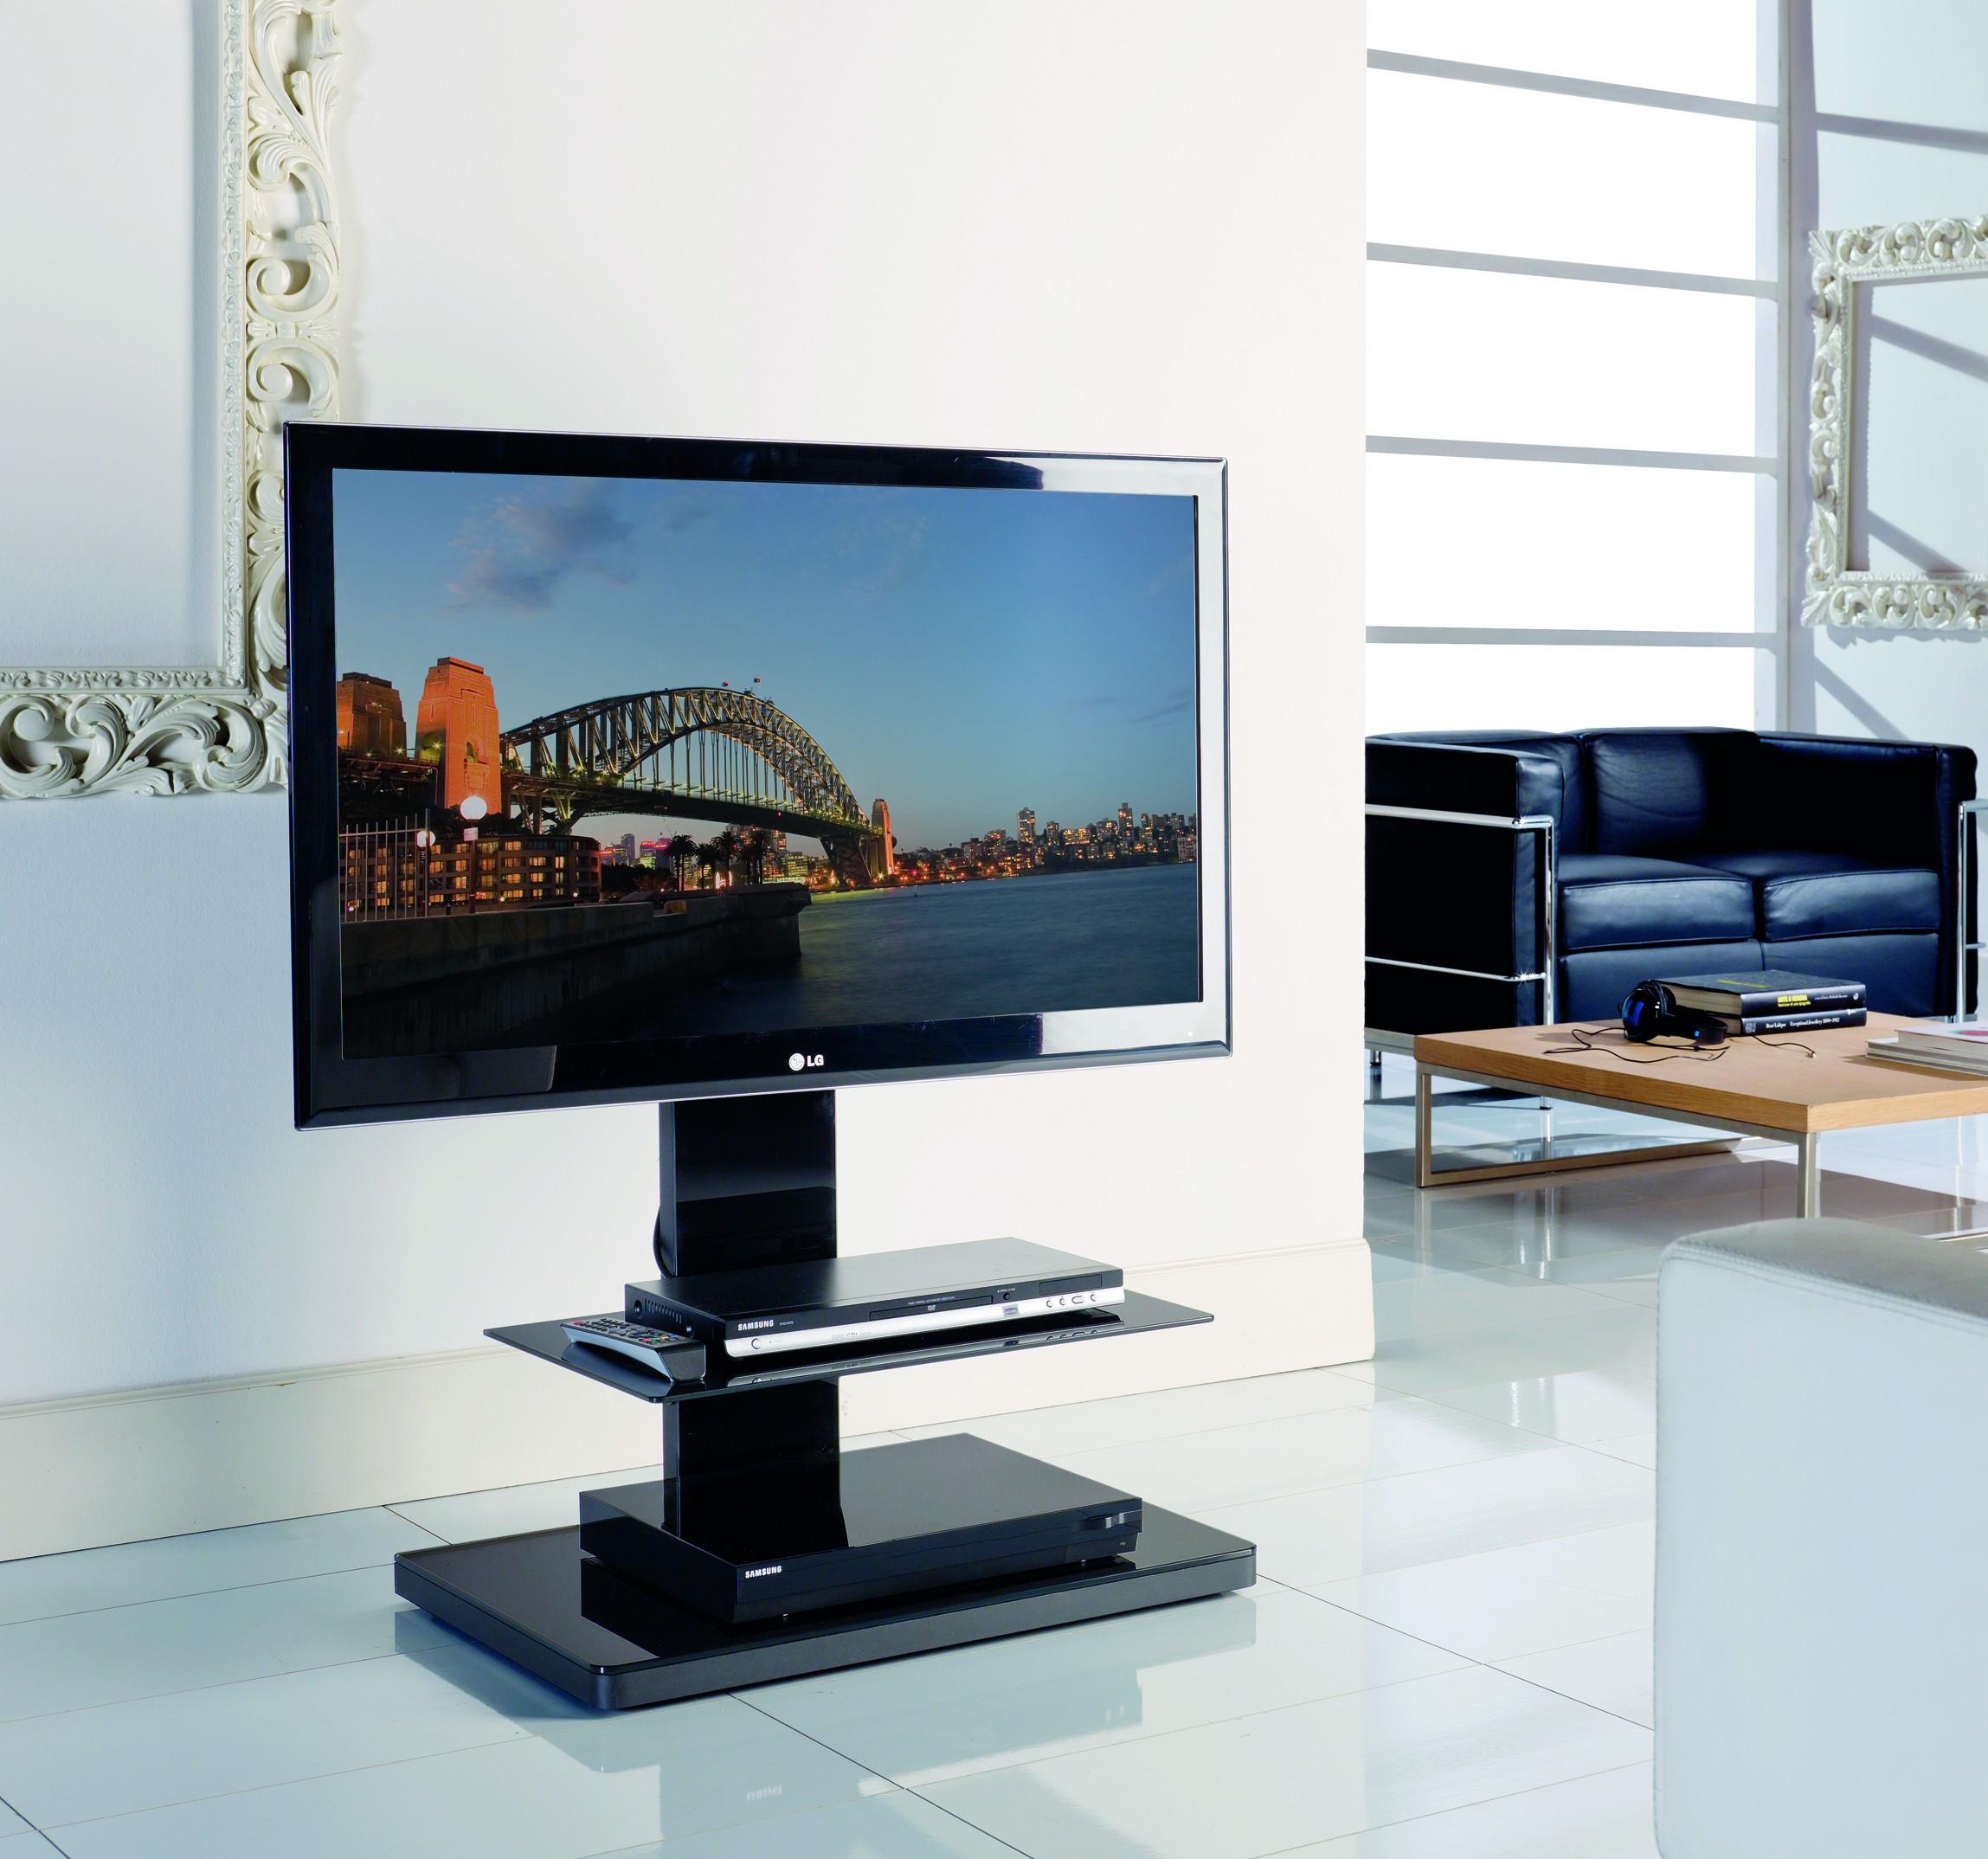 classement guide d achat top t l viseurs cran plat en. Black Bedroom Furniture Sets. Home Design Ideas